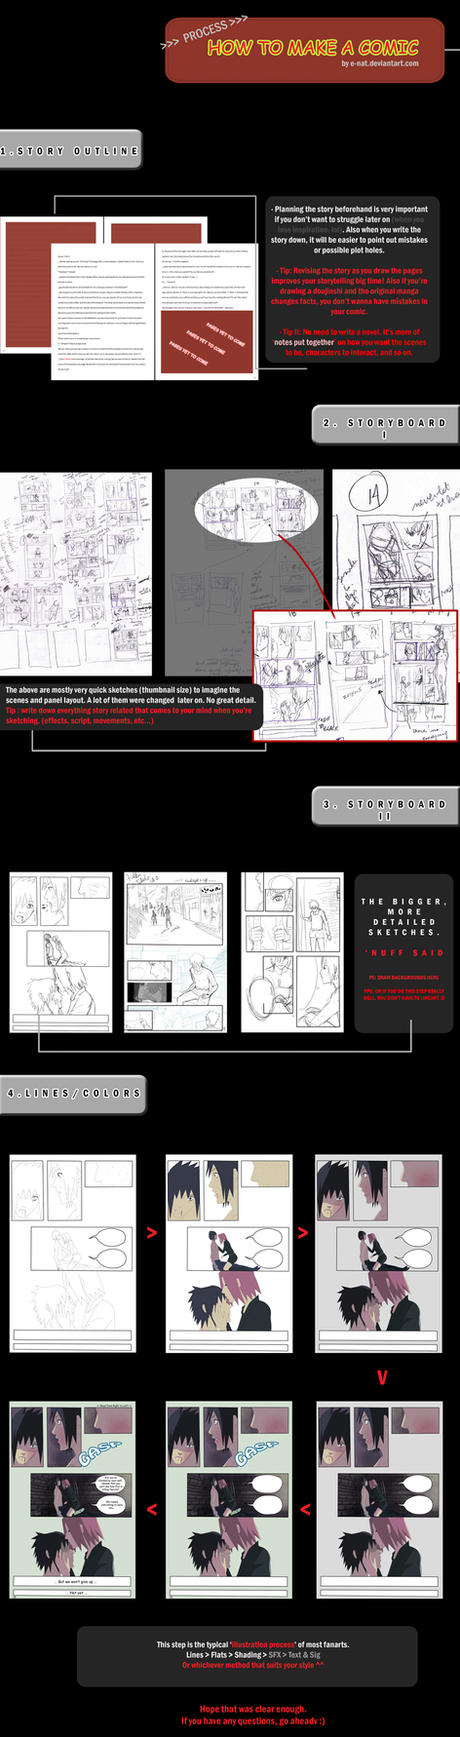 Process- Making a Comic by e-nat